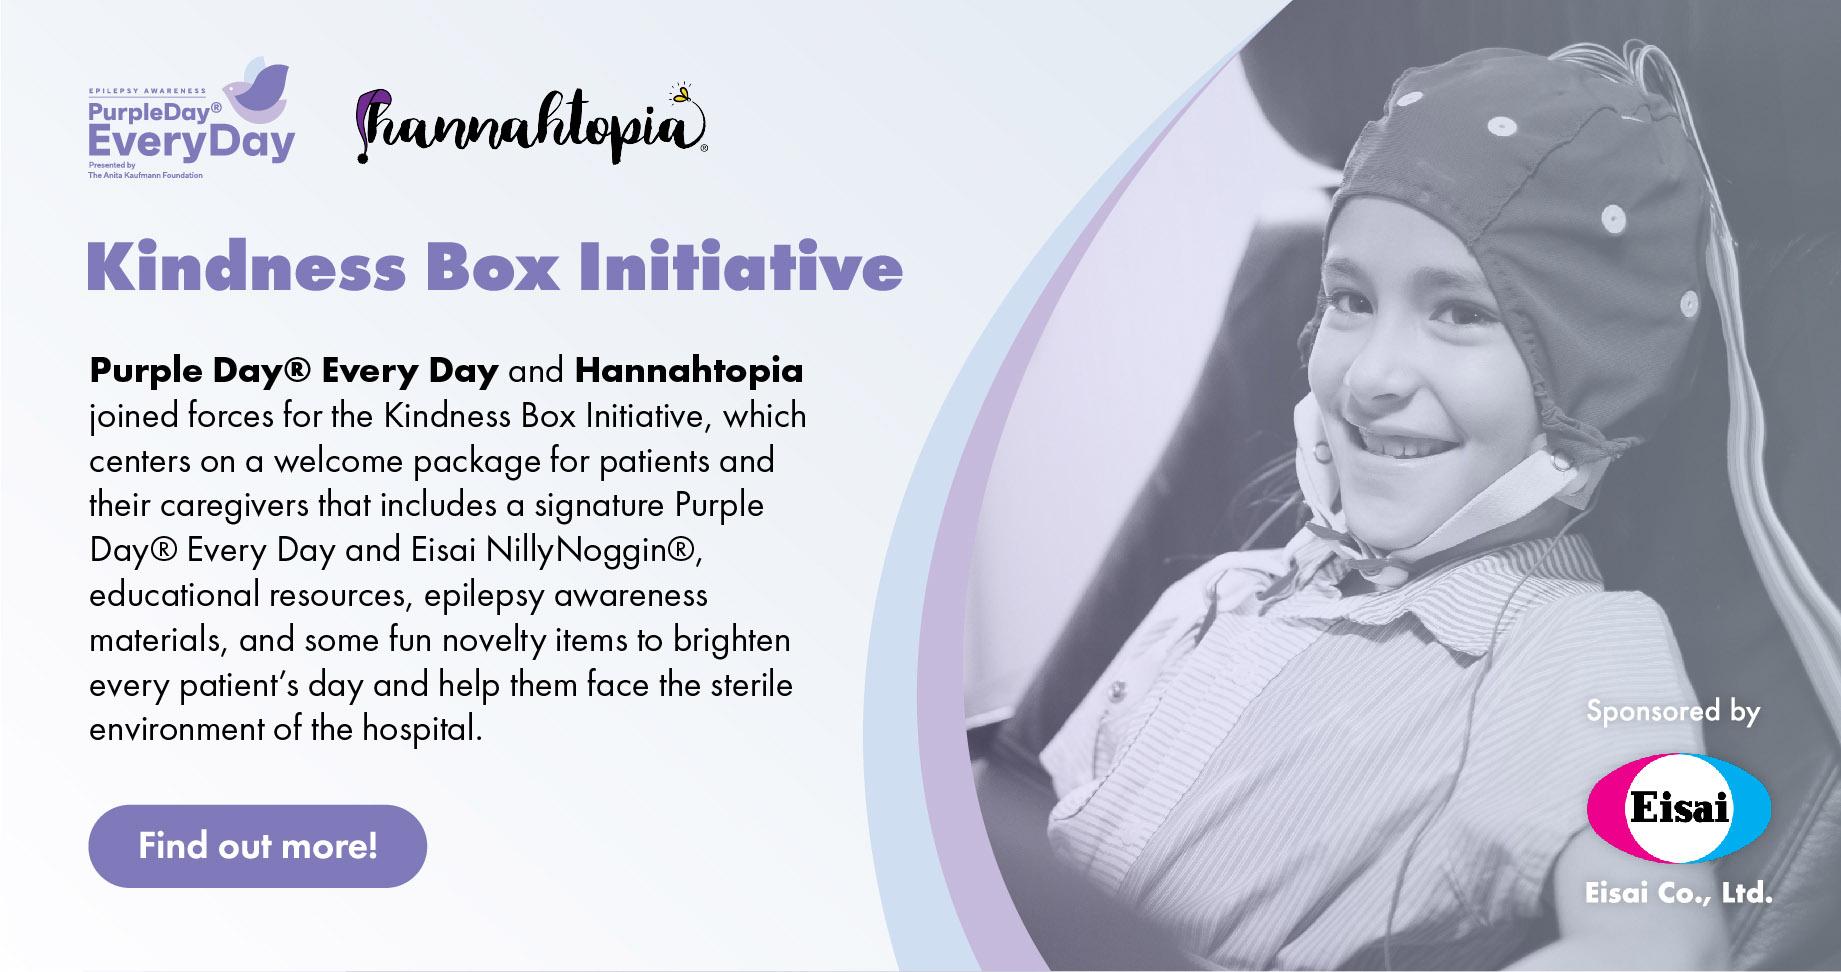 Anita Kaufmann Foundation - Kindness Box Initiative